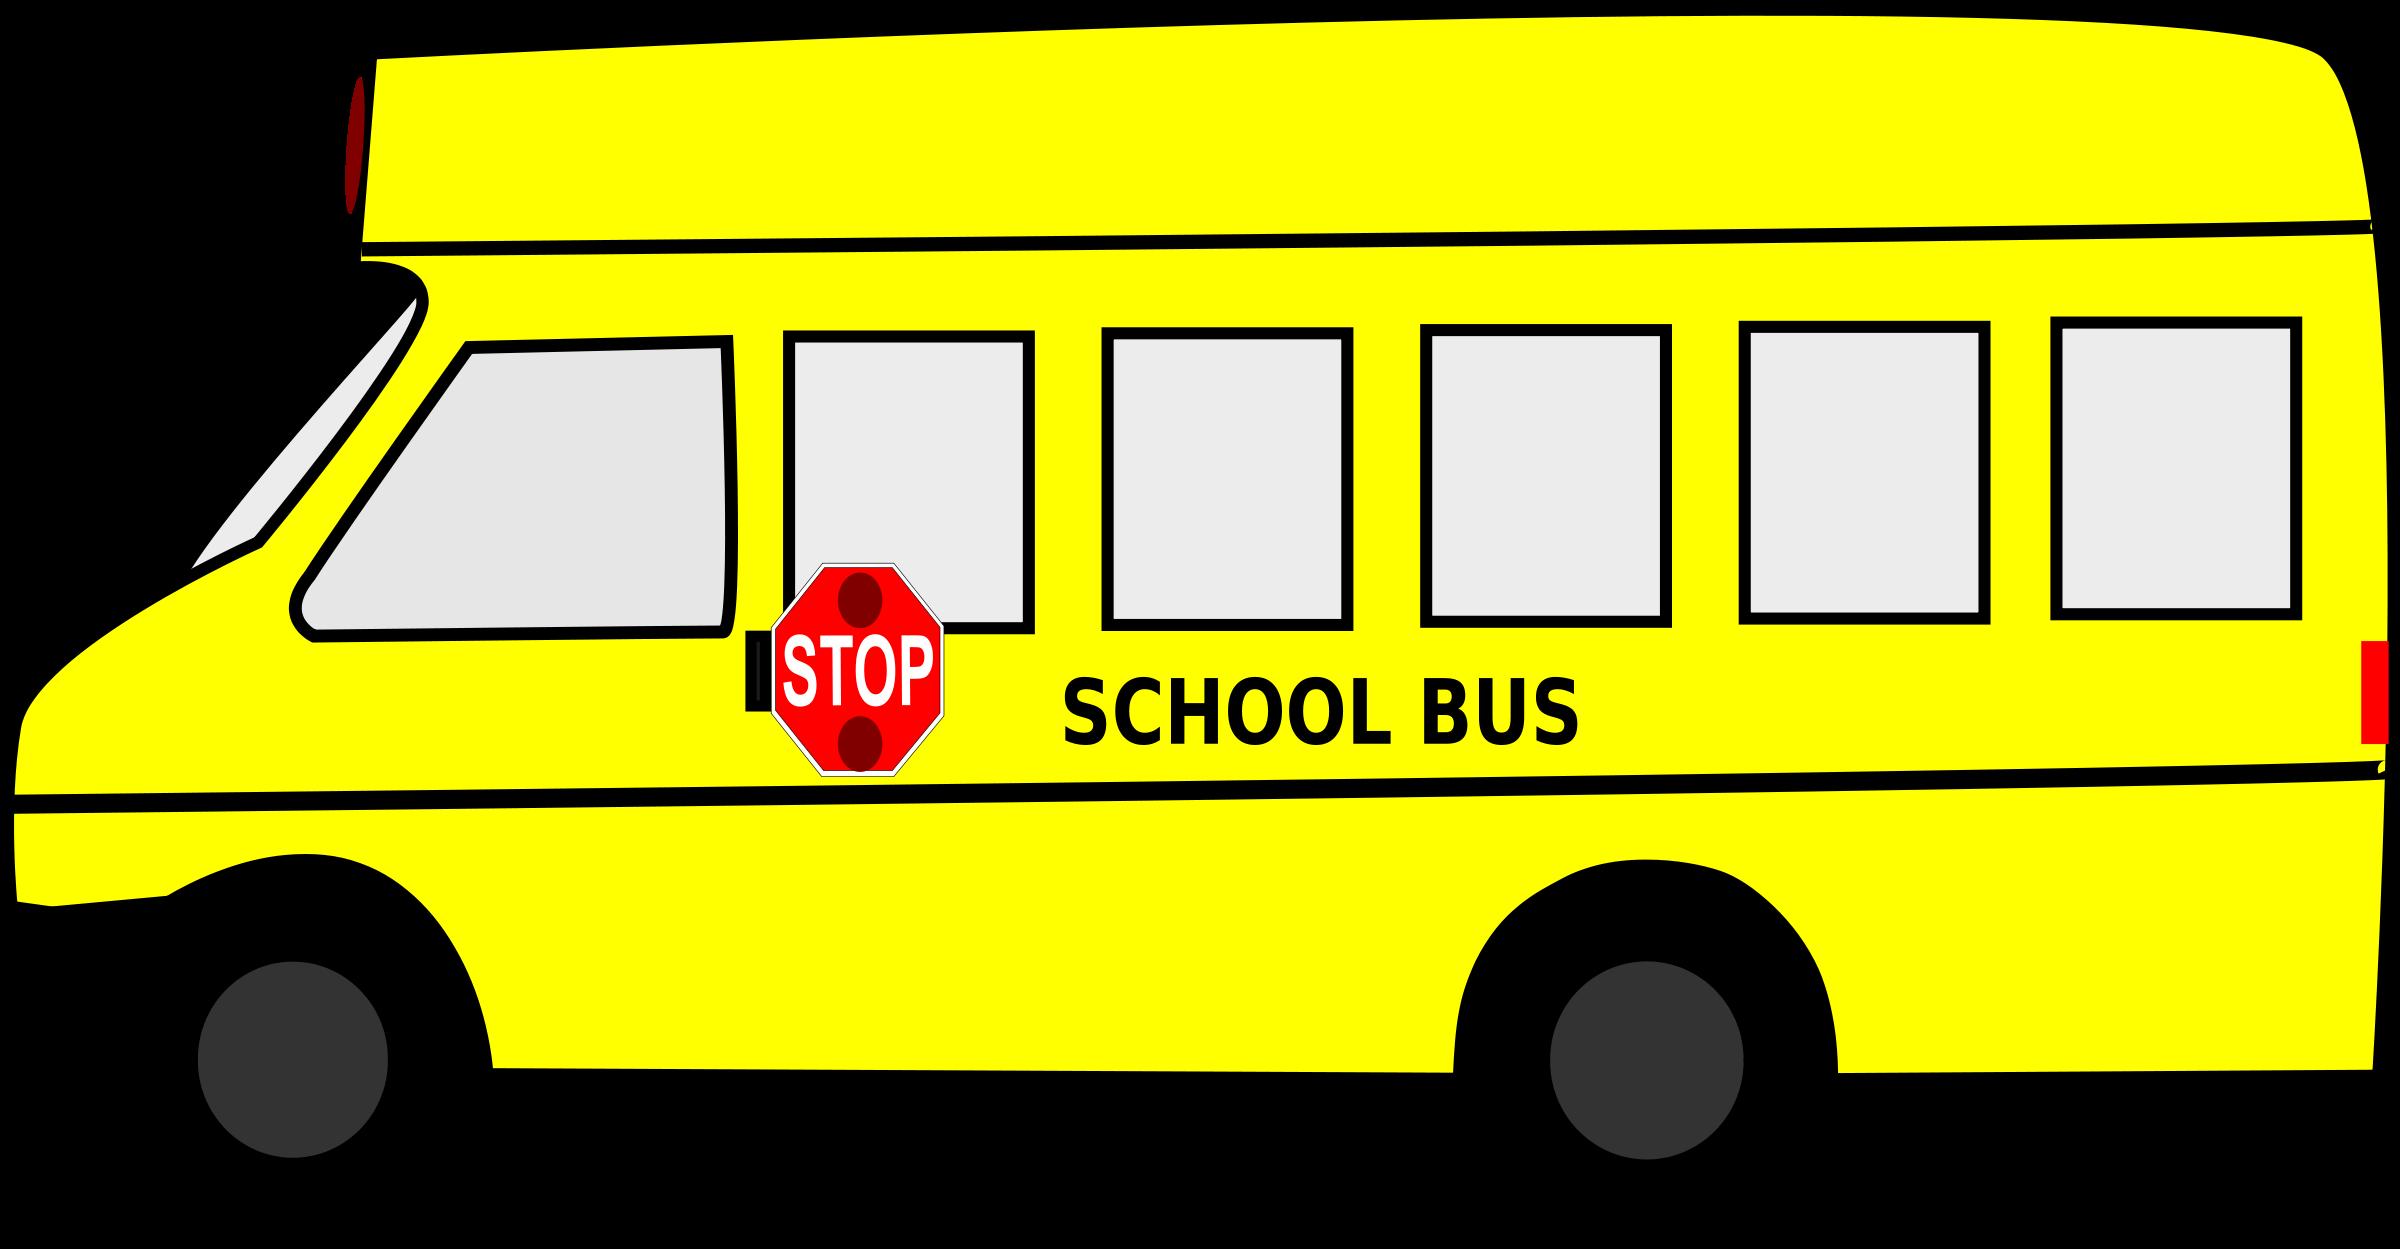 2400x1249 Free Clip Art School Bus Free Clipart Images 6